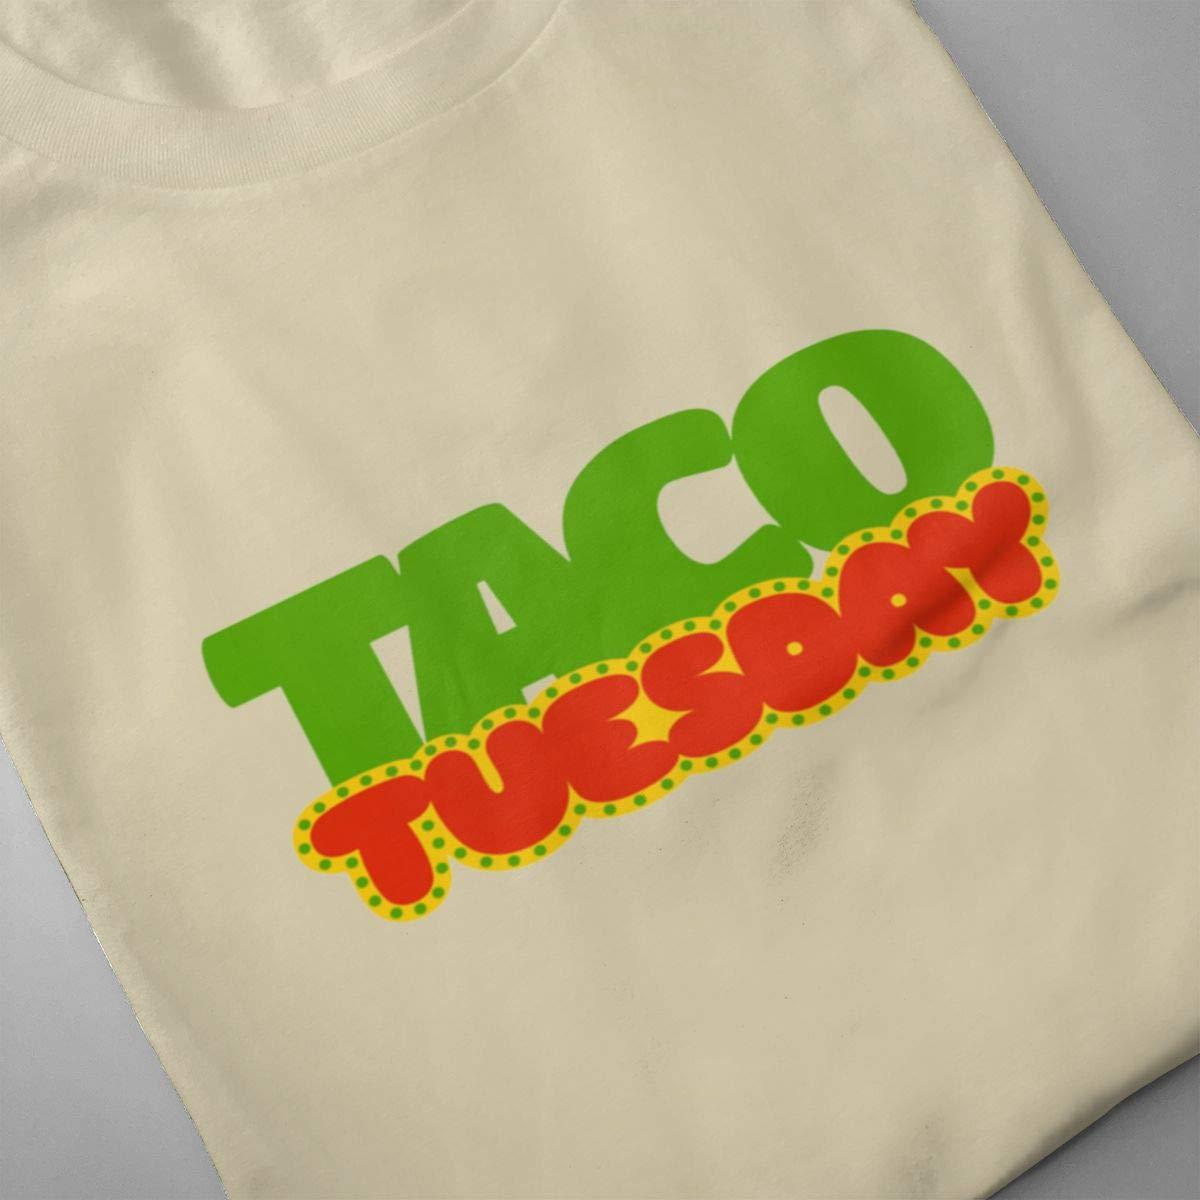 Seuriamin Taco Tuesday Mens Humor Running Short Sleeve Shirts